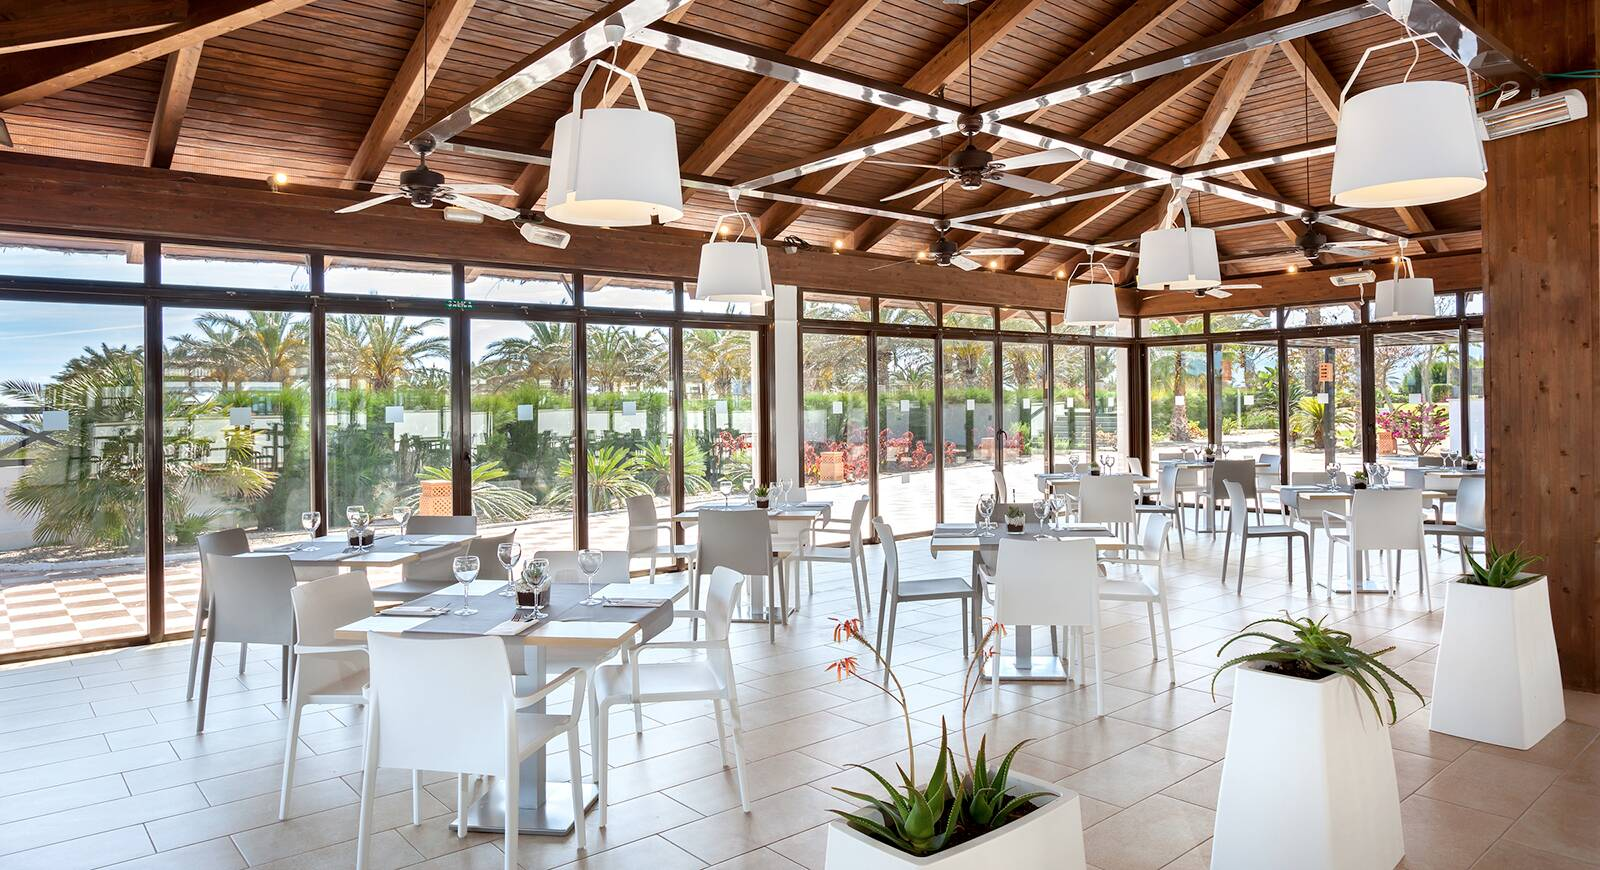 236-restaurant-118-hotel-barcelo-cabo-de-gata_tcm20-136685_w1600_h870_n.jpg